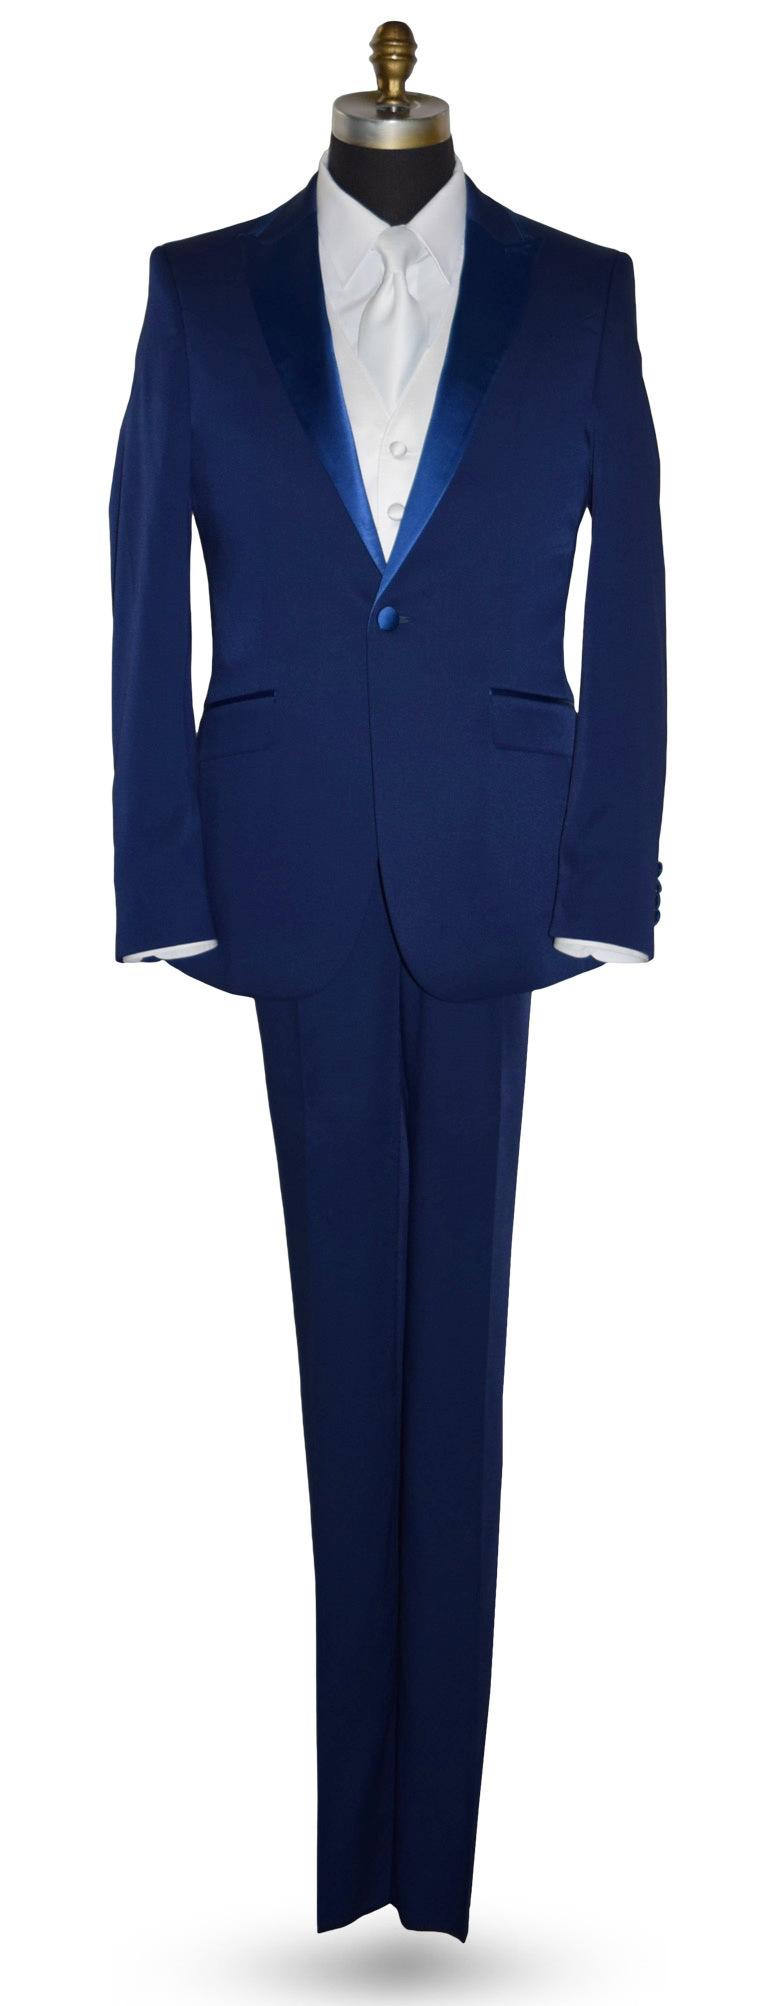 PERSIAN BLUE TUXEDO COAT AND PANTS SET